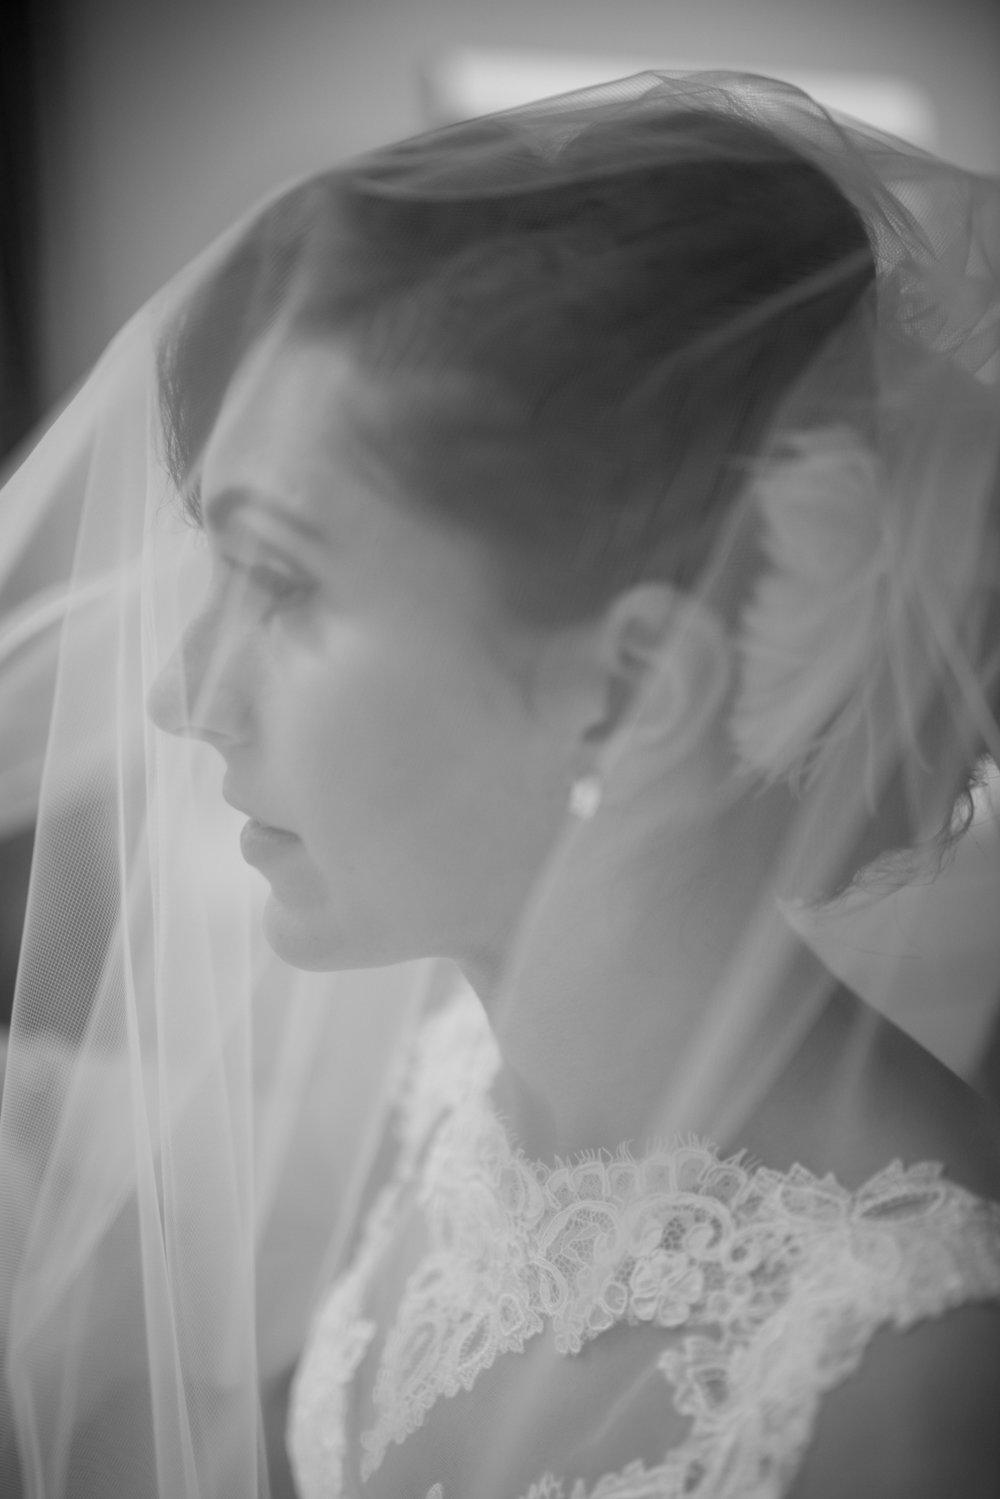 Bridal Wedding Portraits- Black and White Photography- New Jersey Weddings- Olivia Christina Photography